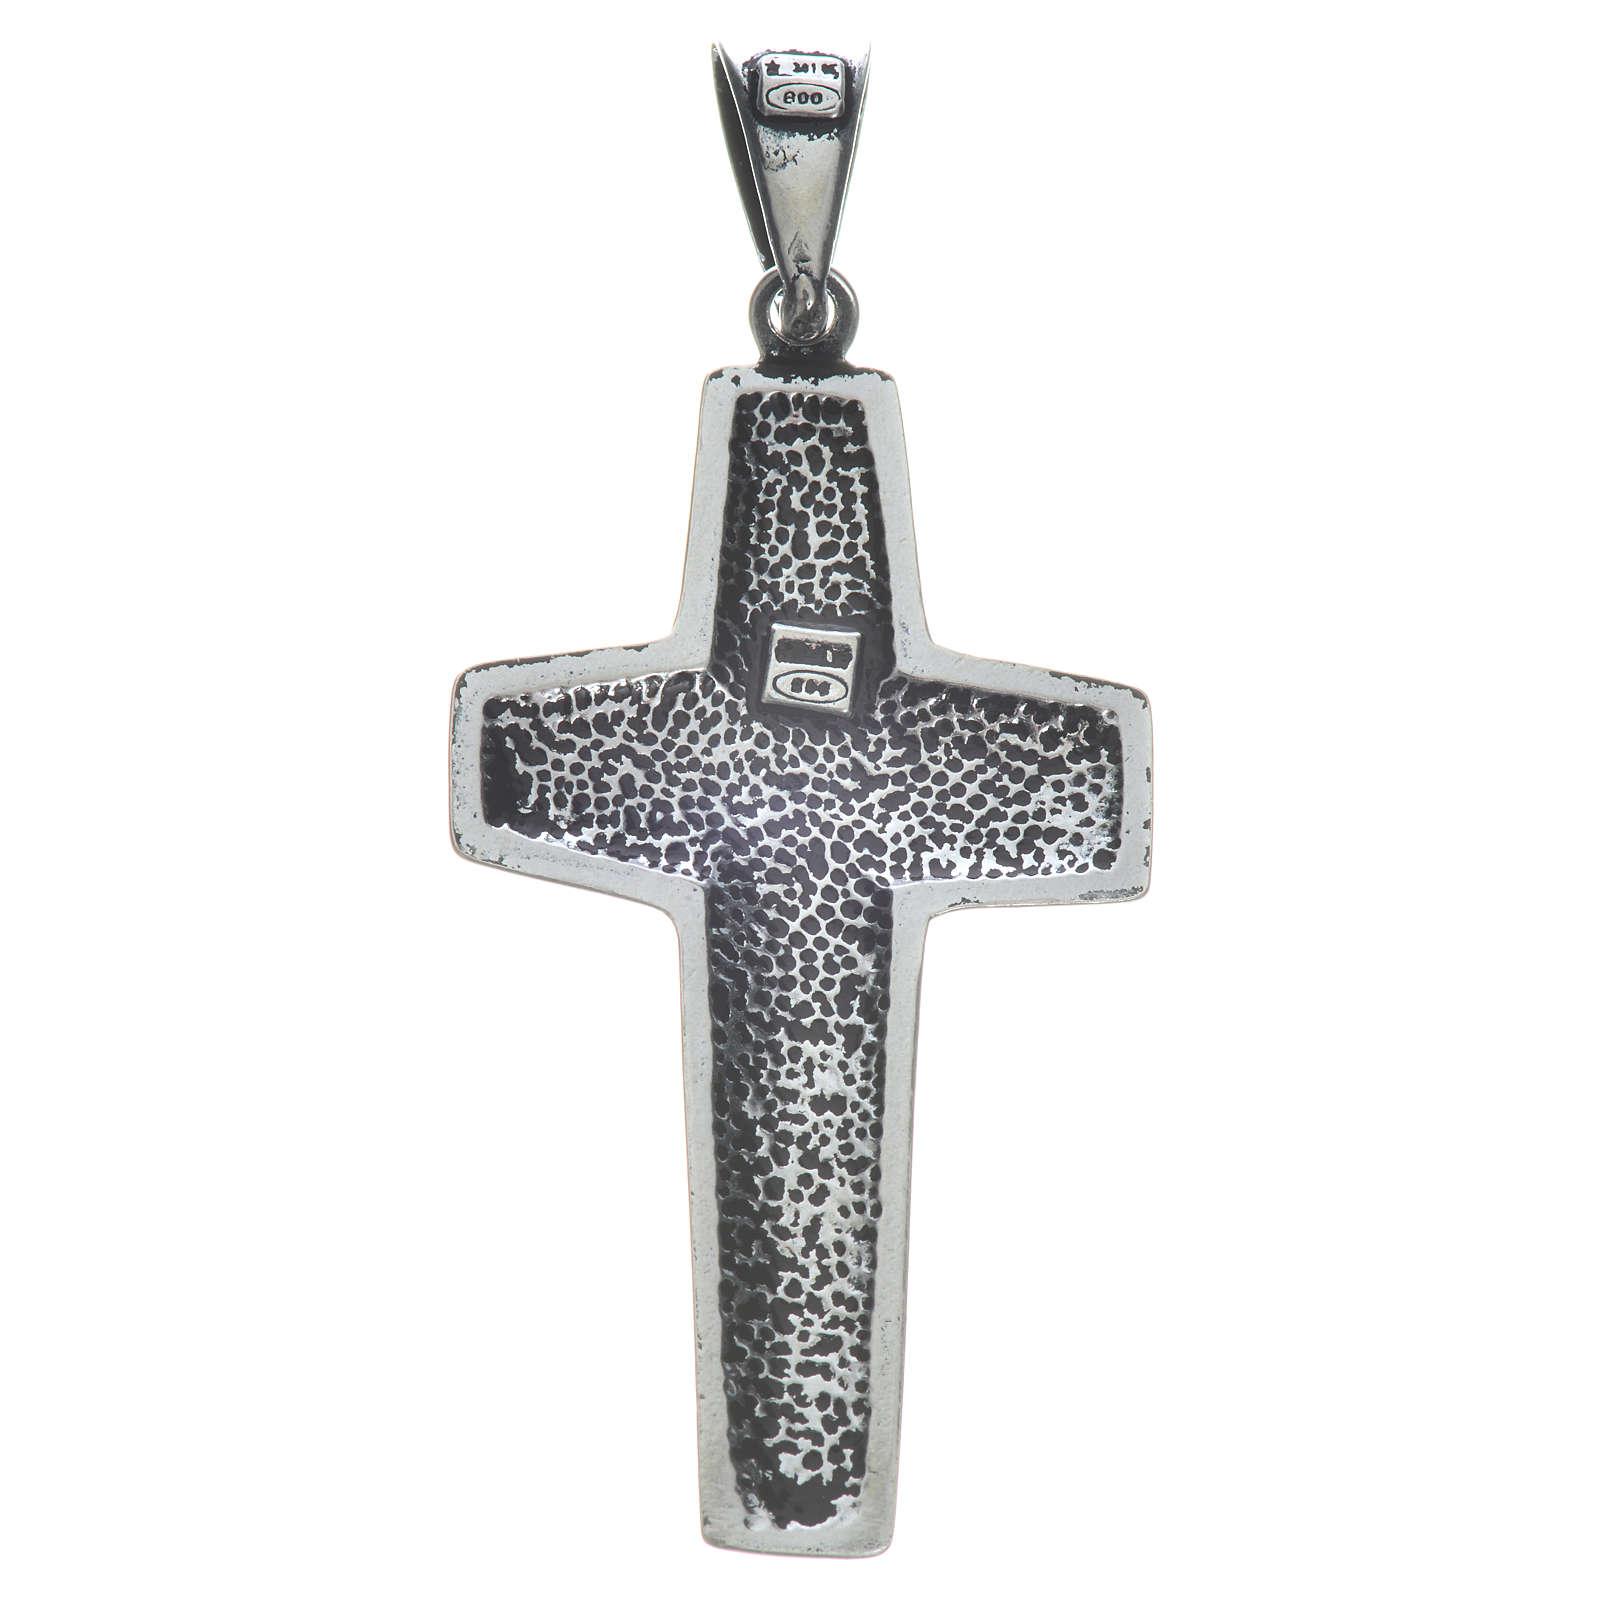 Pope Francis cross 4x2cm in 800 silver 4